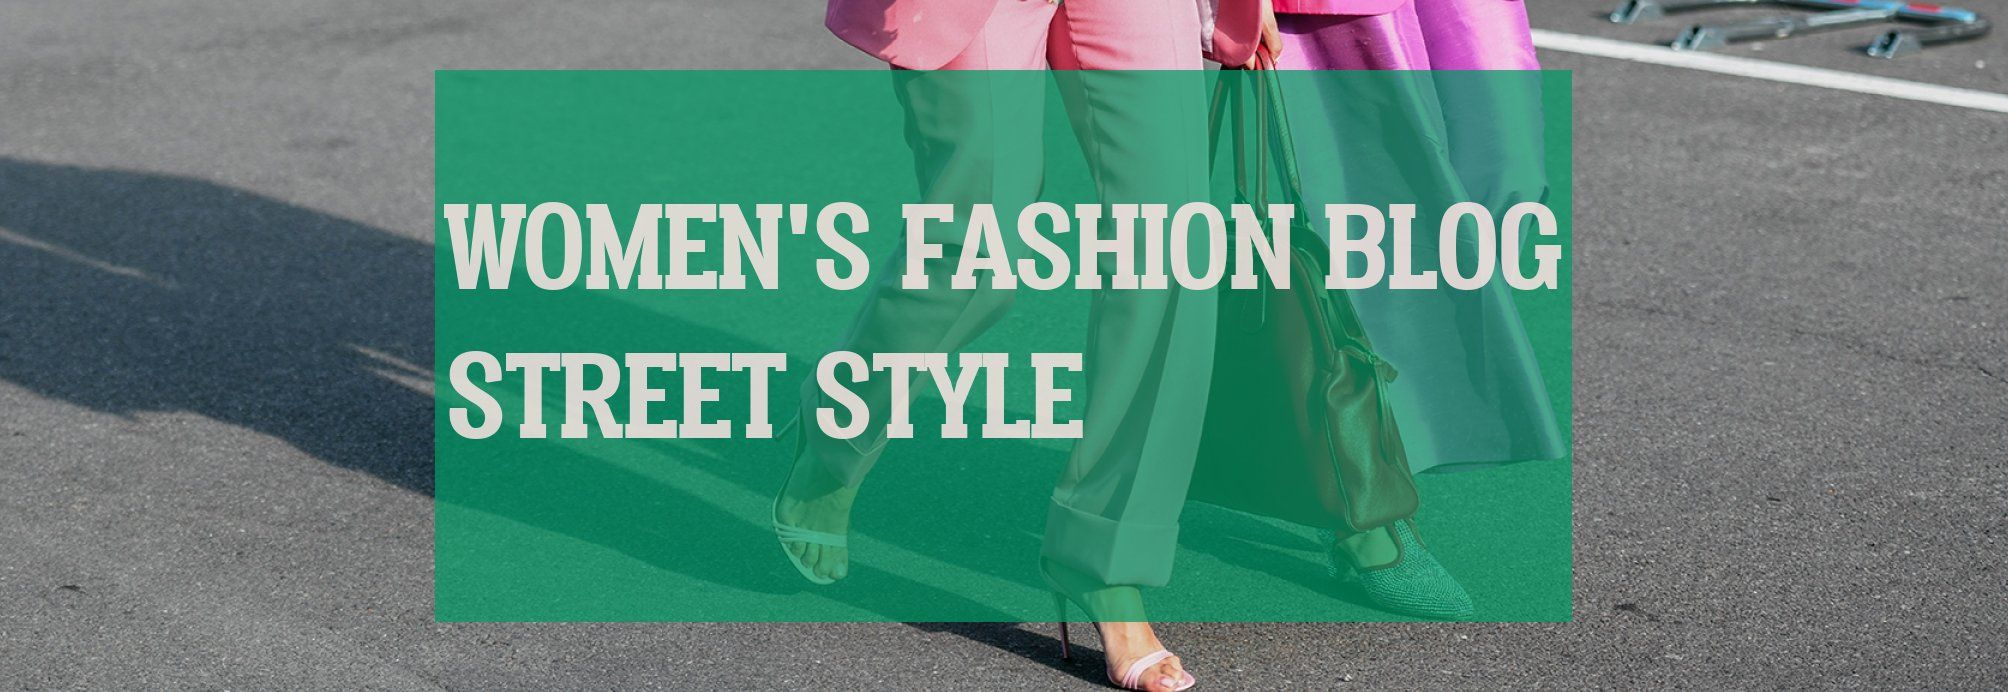 women's fashion blog street style